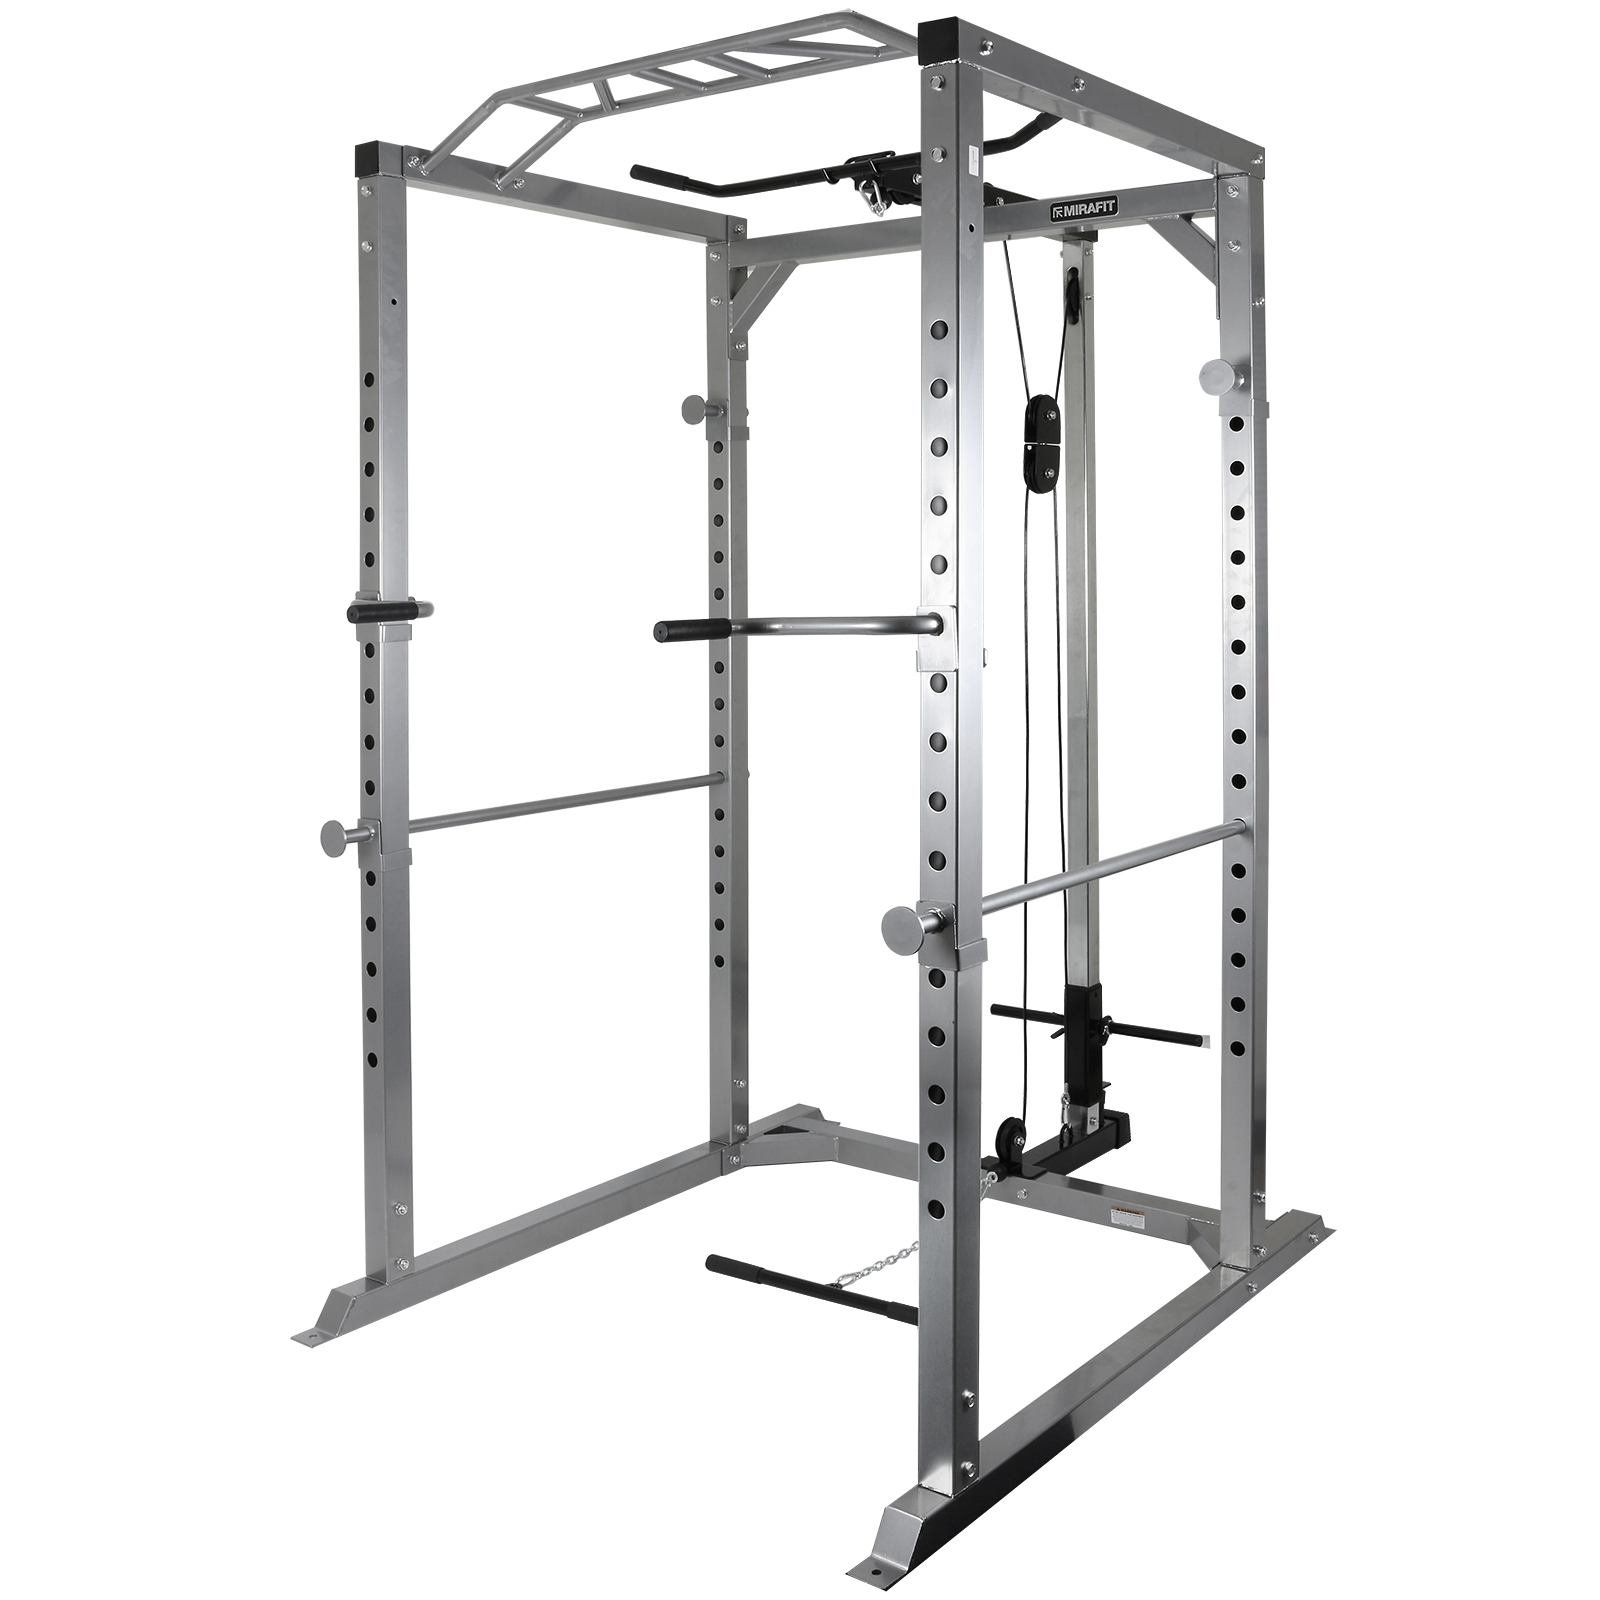 Mirafit 350kg Heavy Duty Olympic Power Cage Squat Rack